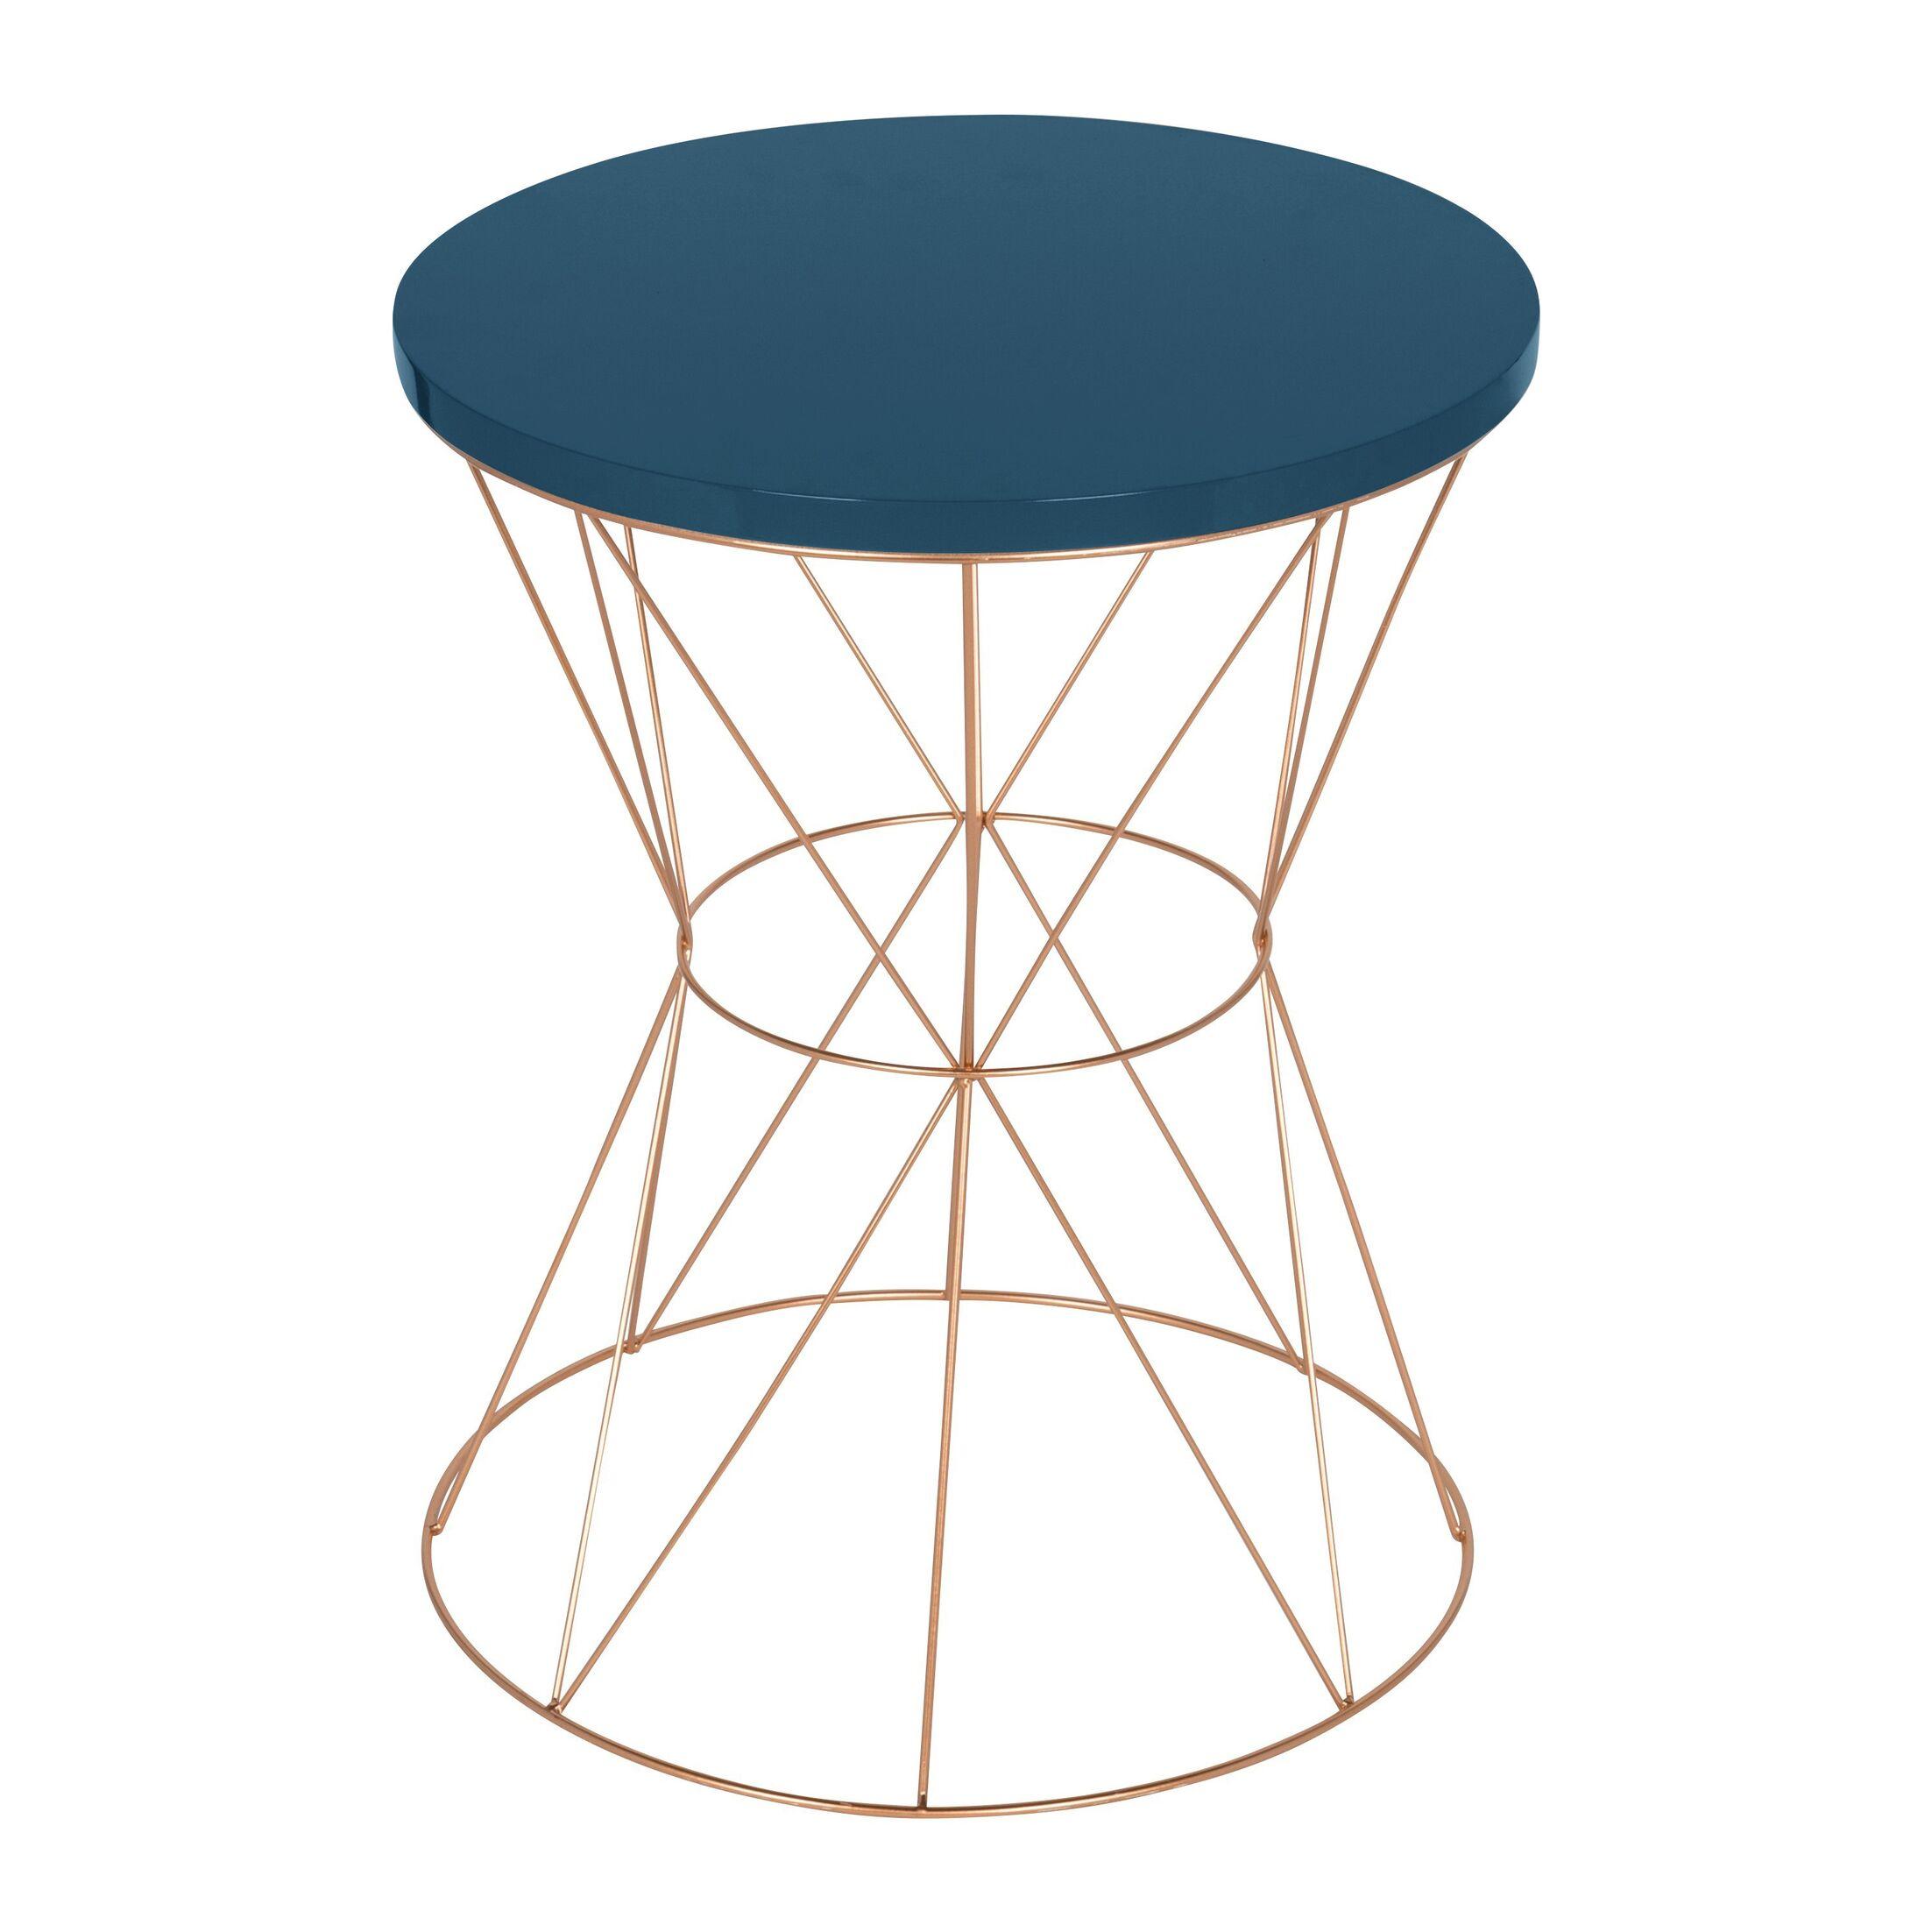 Galien End Table Table Top Color: Blue